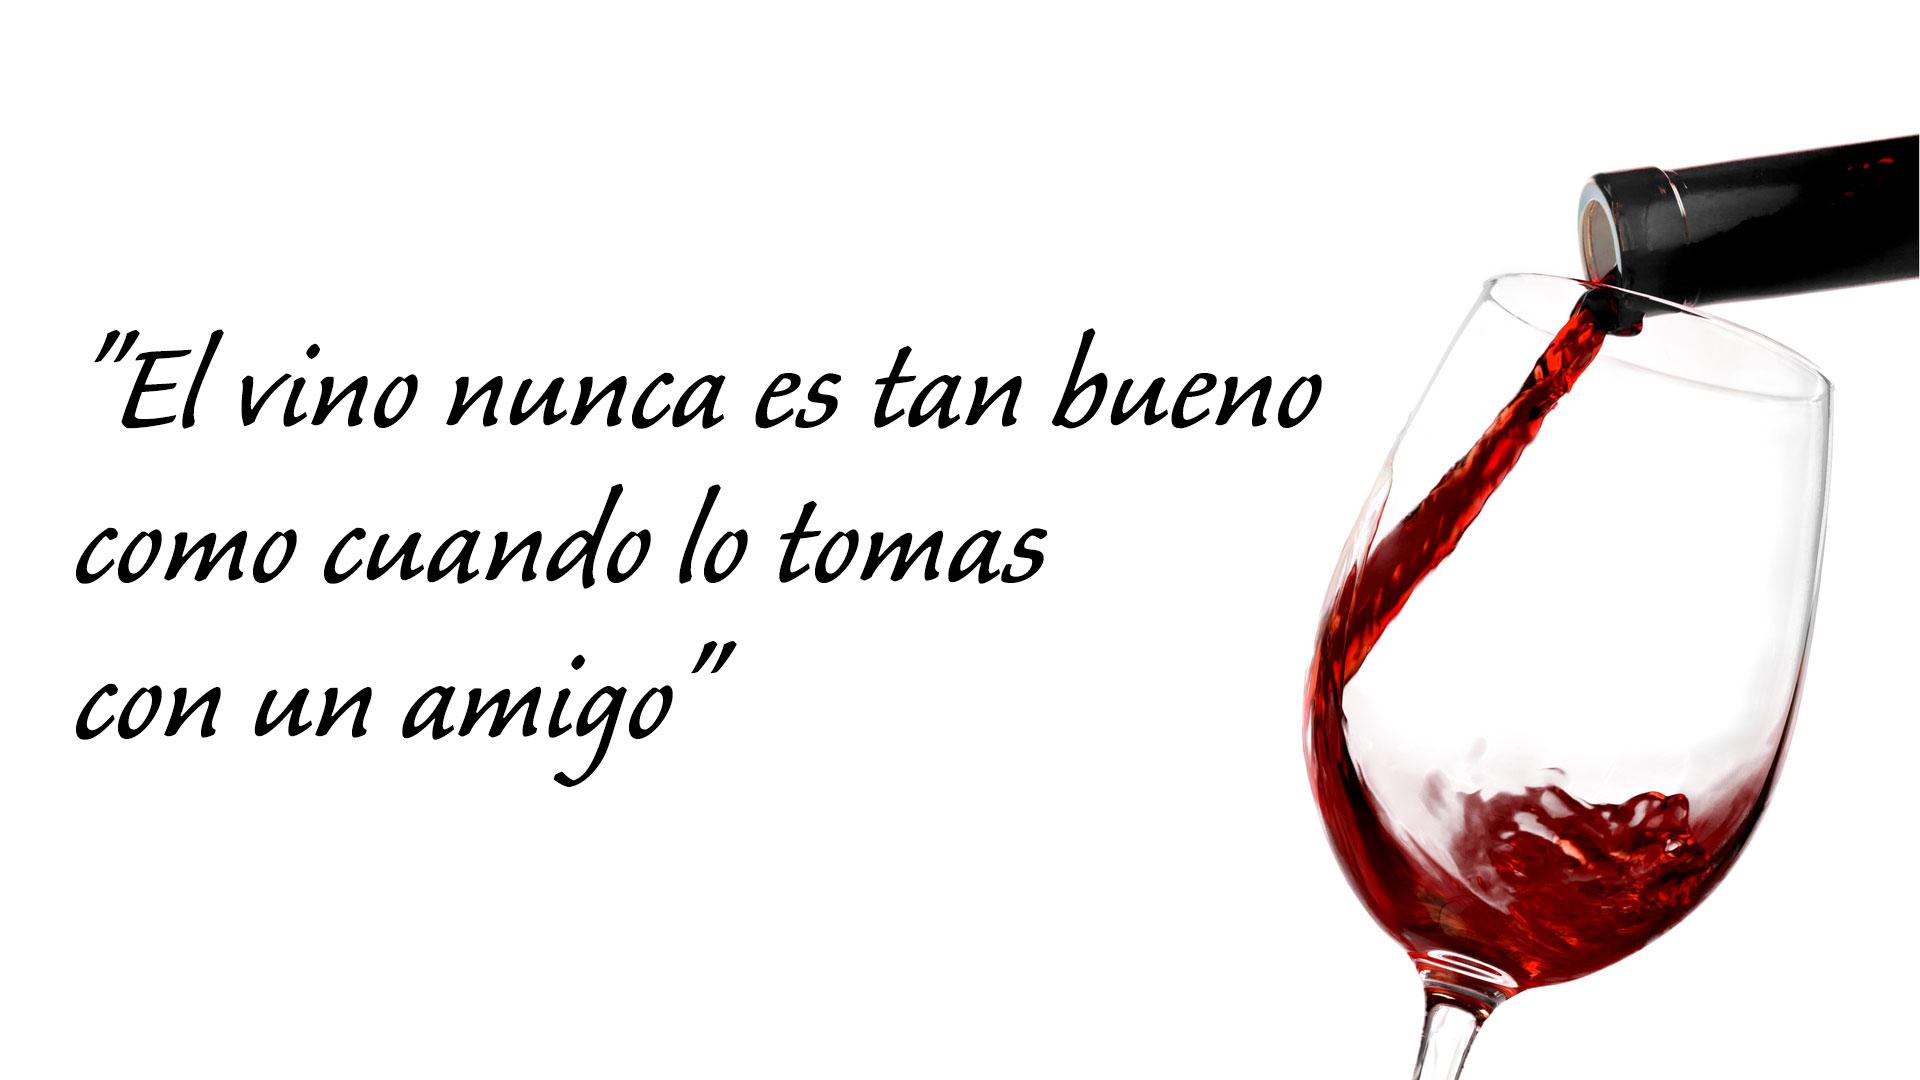 In Vino Frances Veritas - Blog de Vino